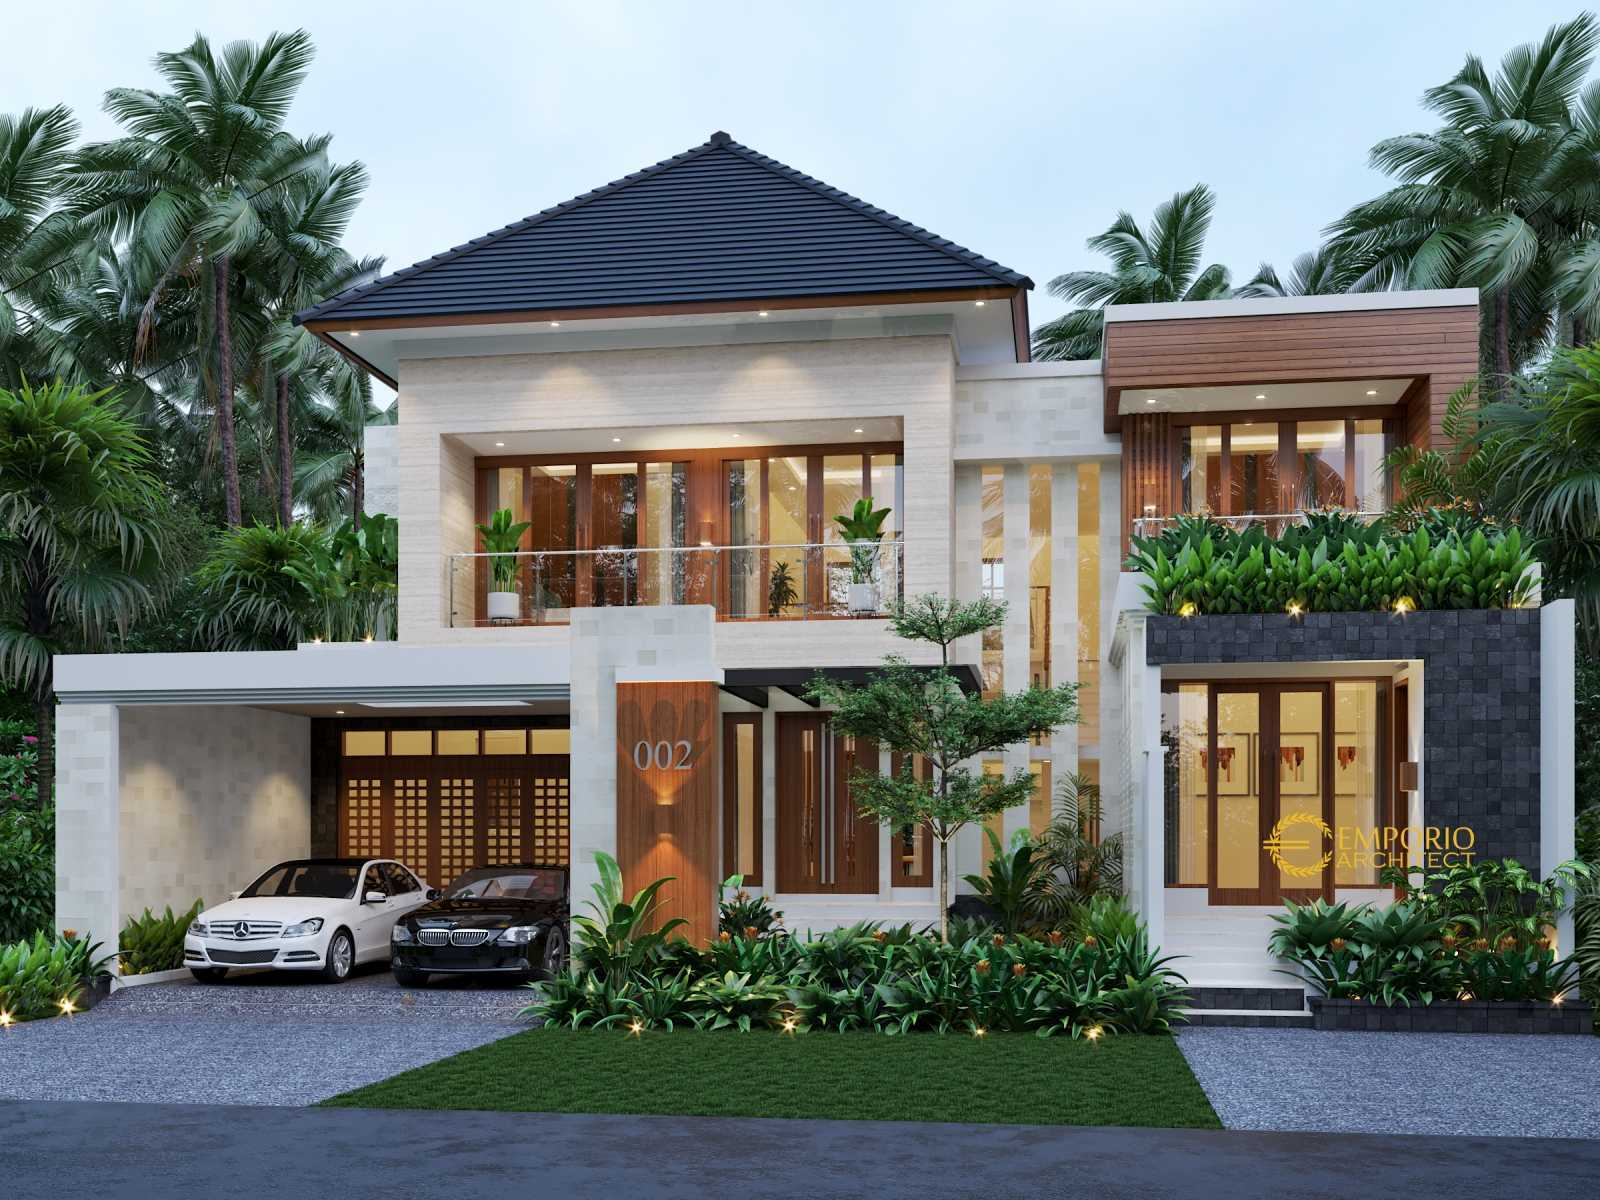 Photo Emporio Architect Desain Rumah Modern Tropis 591 Ii Madiun Jawa Timur Desain Rumah Modern Tropis 591 Ii Madiun Jawa Timur 2 Desain Arsitek Oleh Emporio Architect Arsitag